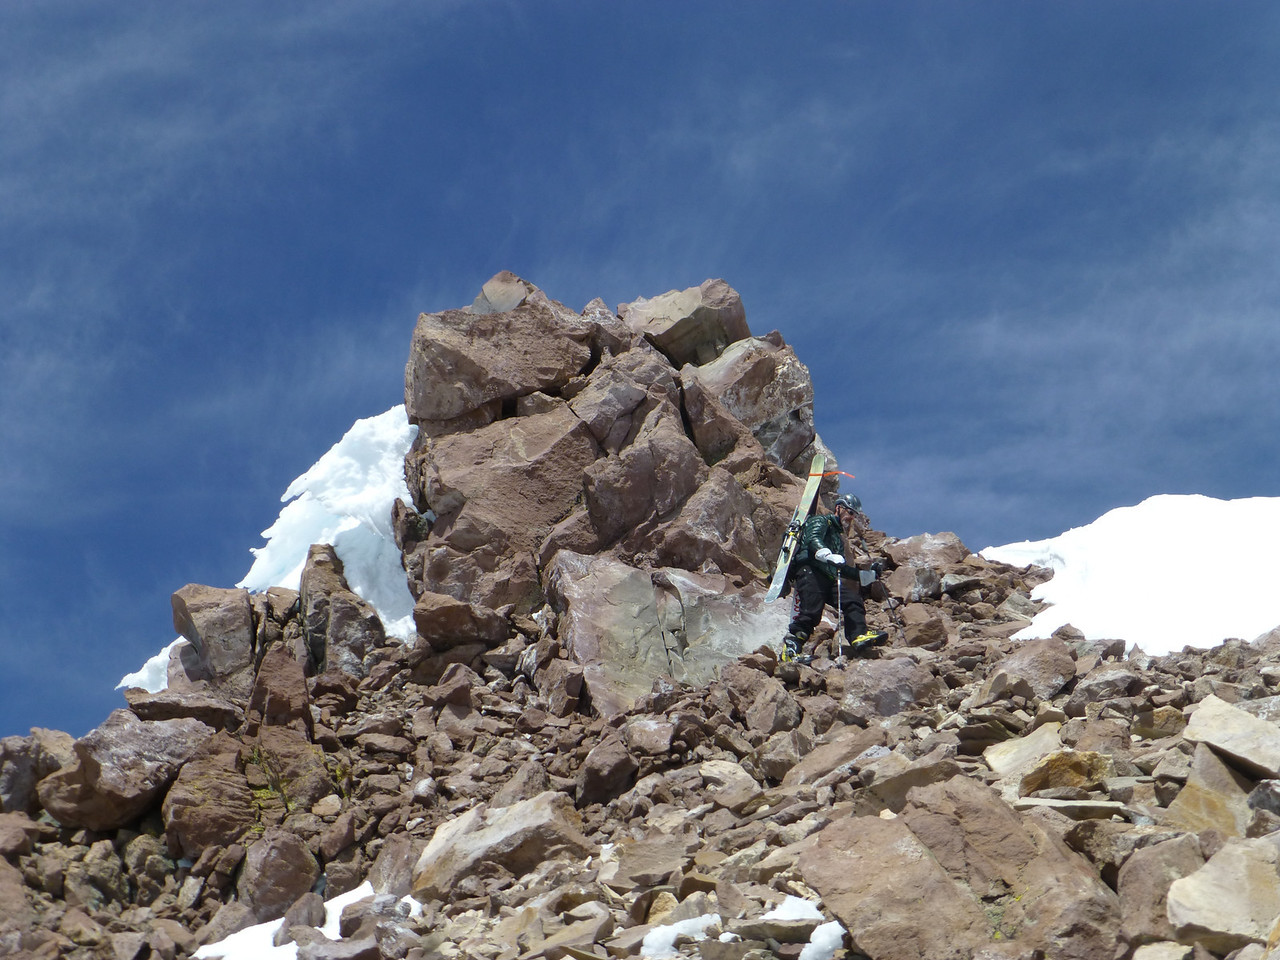 Rick coming down off the summit of Shastina.